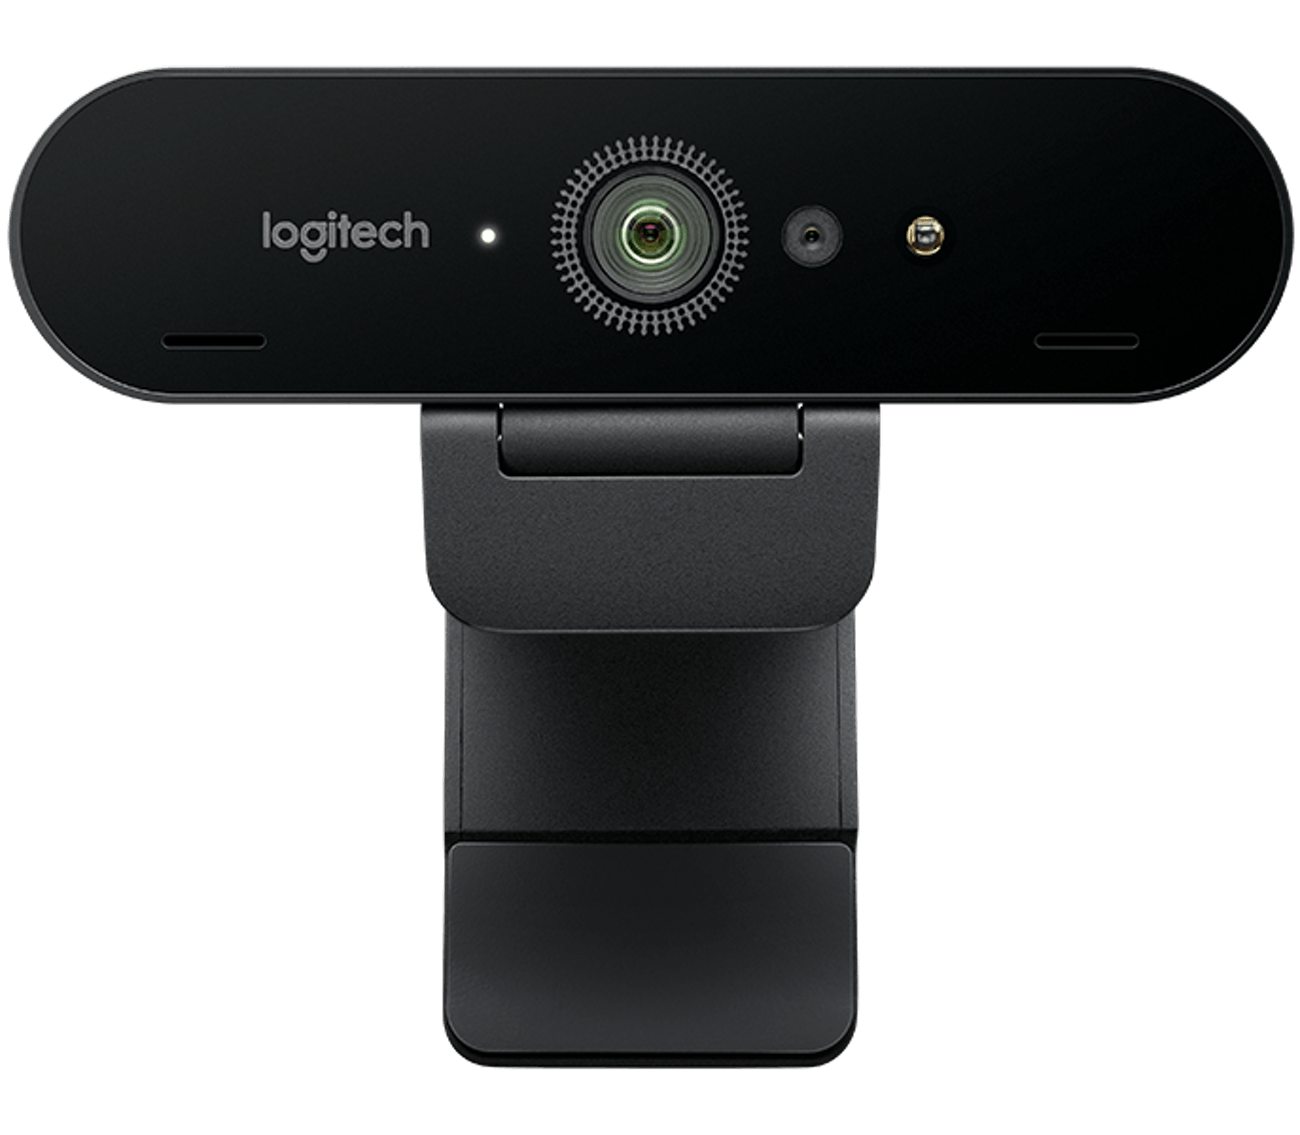 Logitech Streaming 4k Webcam